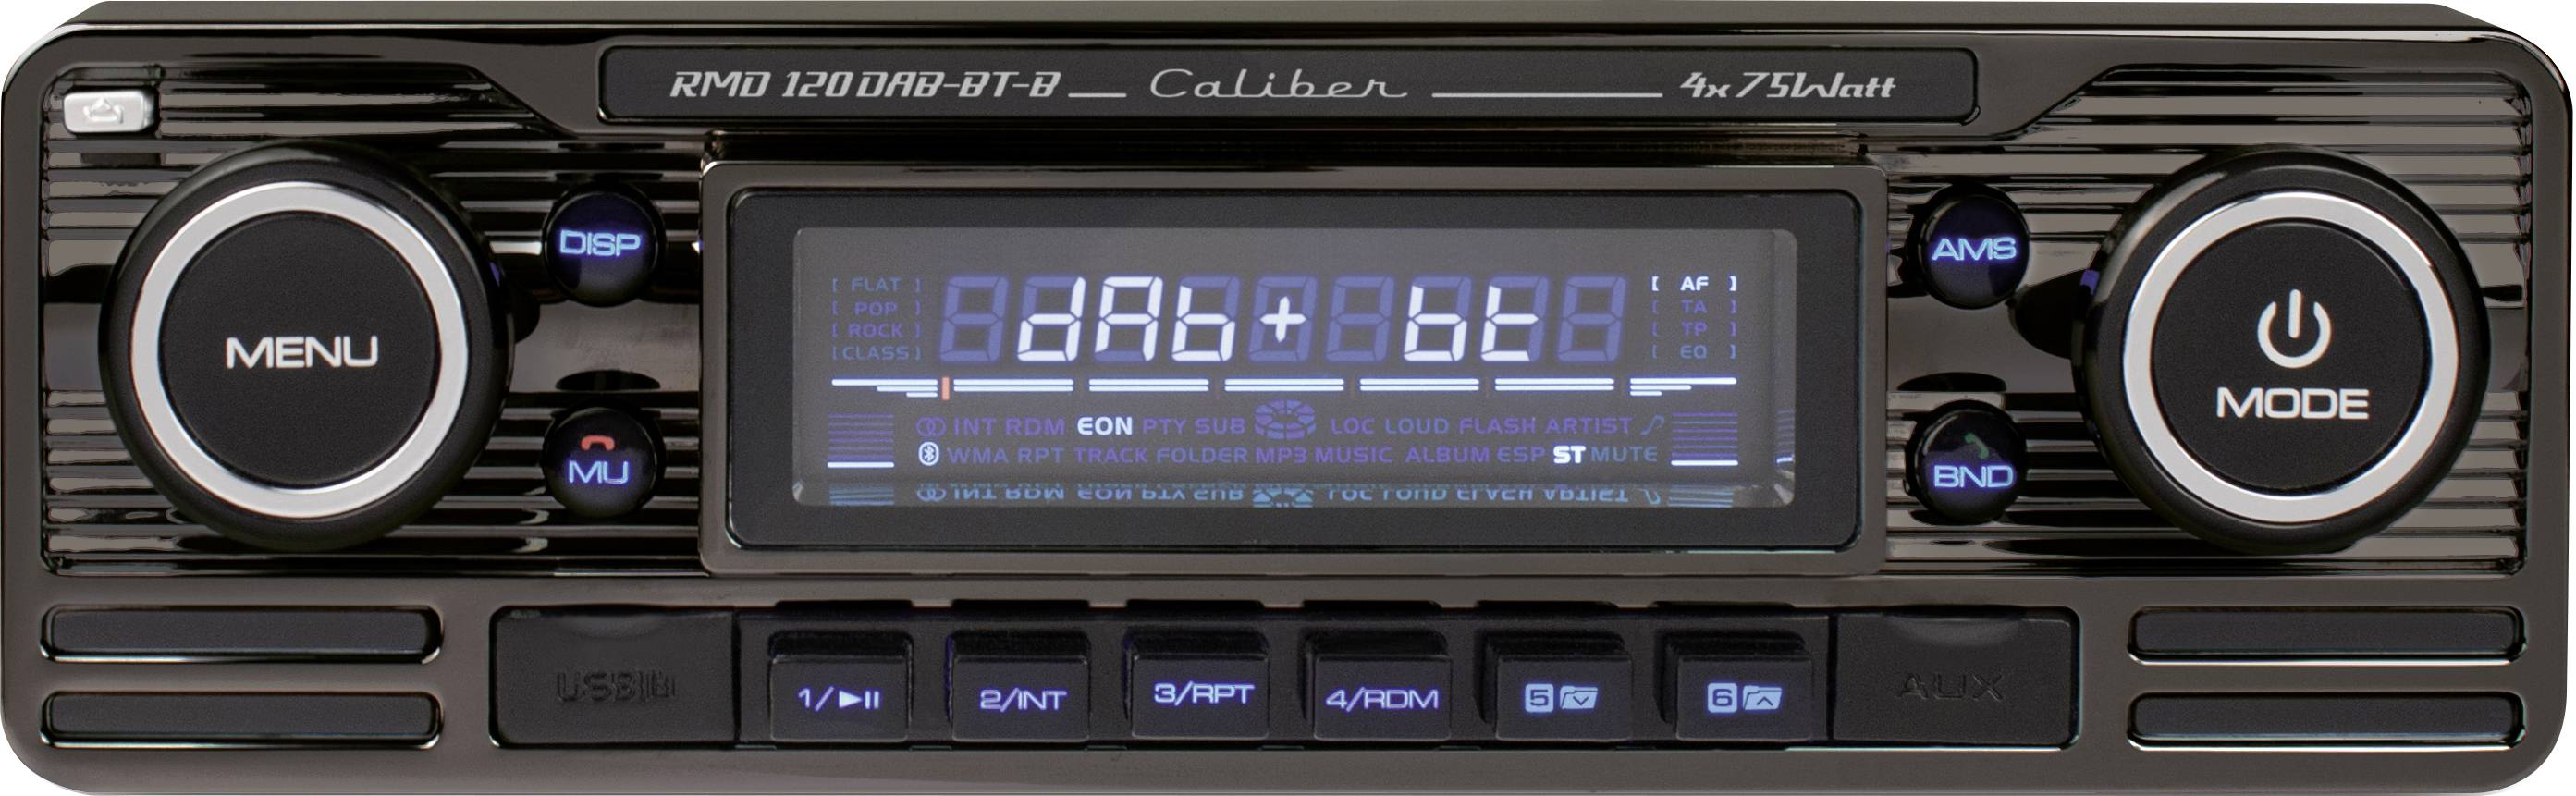 Conrad-Caliber Audio Technology RMD120DAB-BT-B Autoradio enkel DIN Bluetooth handsfree, Incl. DAB-antenne, Retrodesign-aanbieding